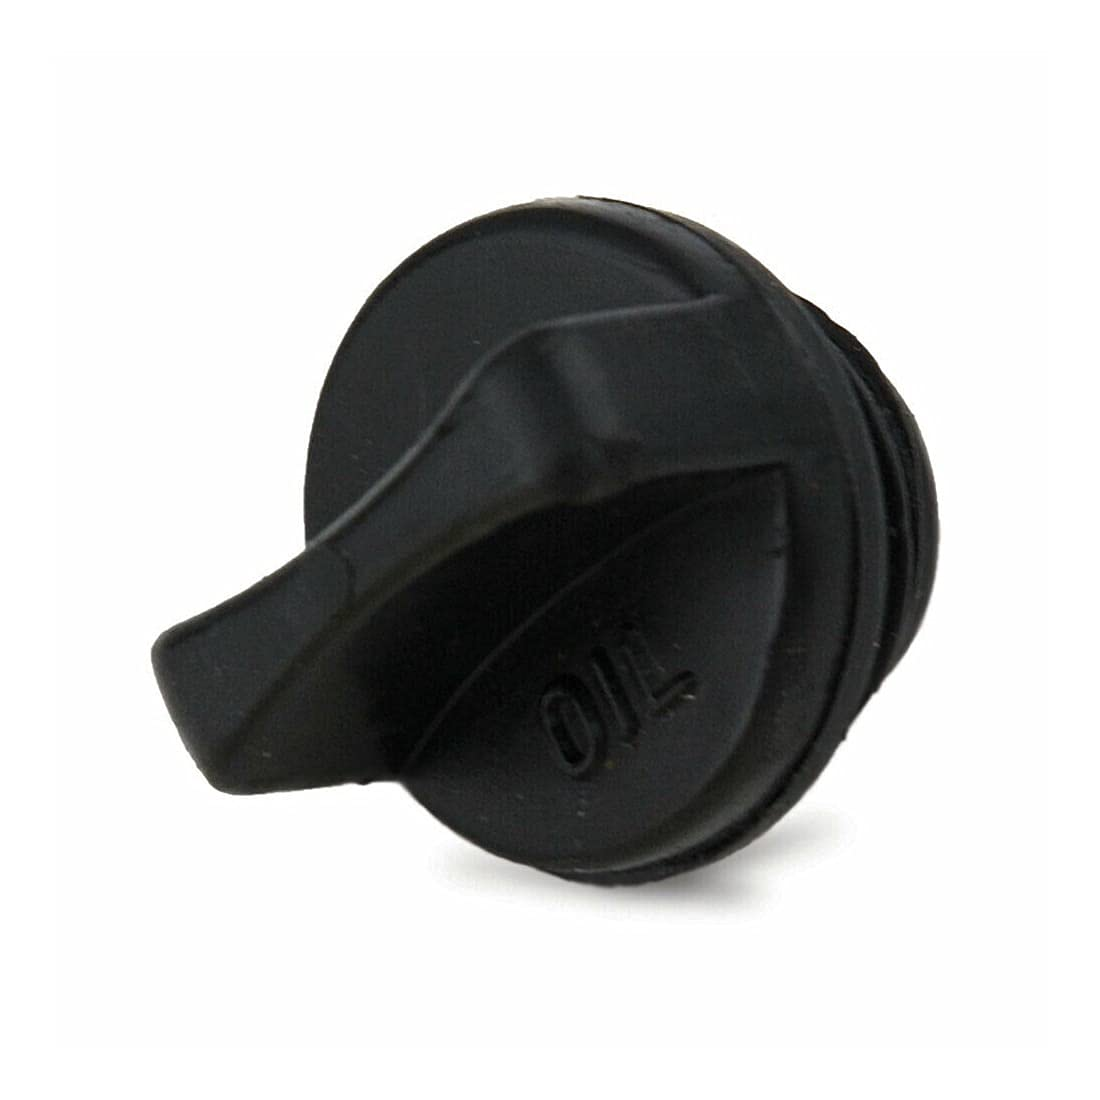 50-454 Part Cap Limited time trial price Mesa Mall Oil Gx390 Gx340 50454 Gx240